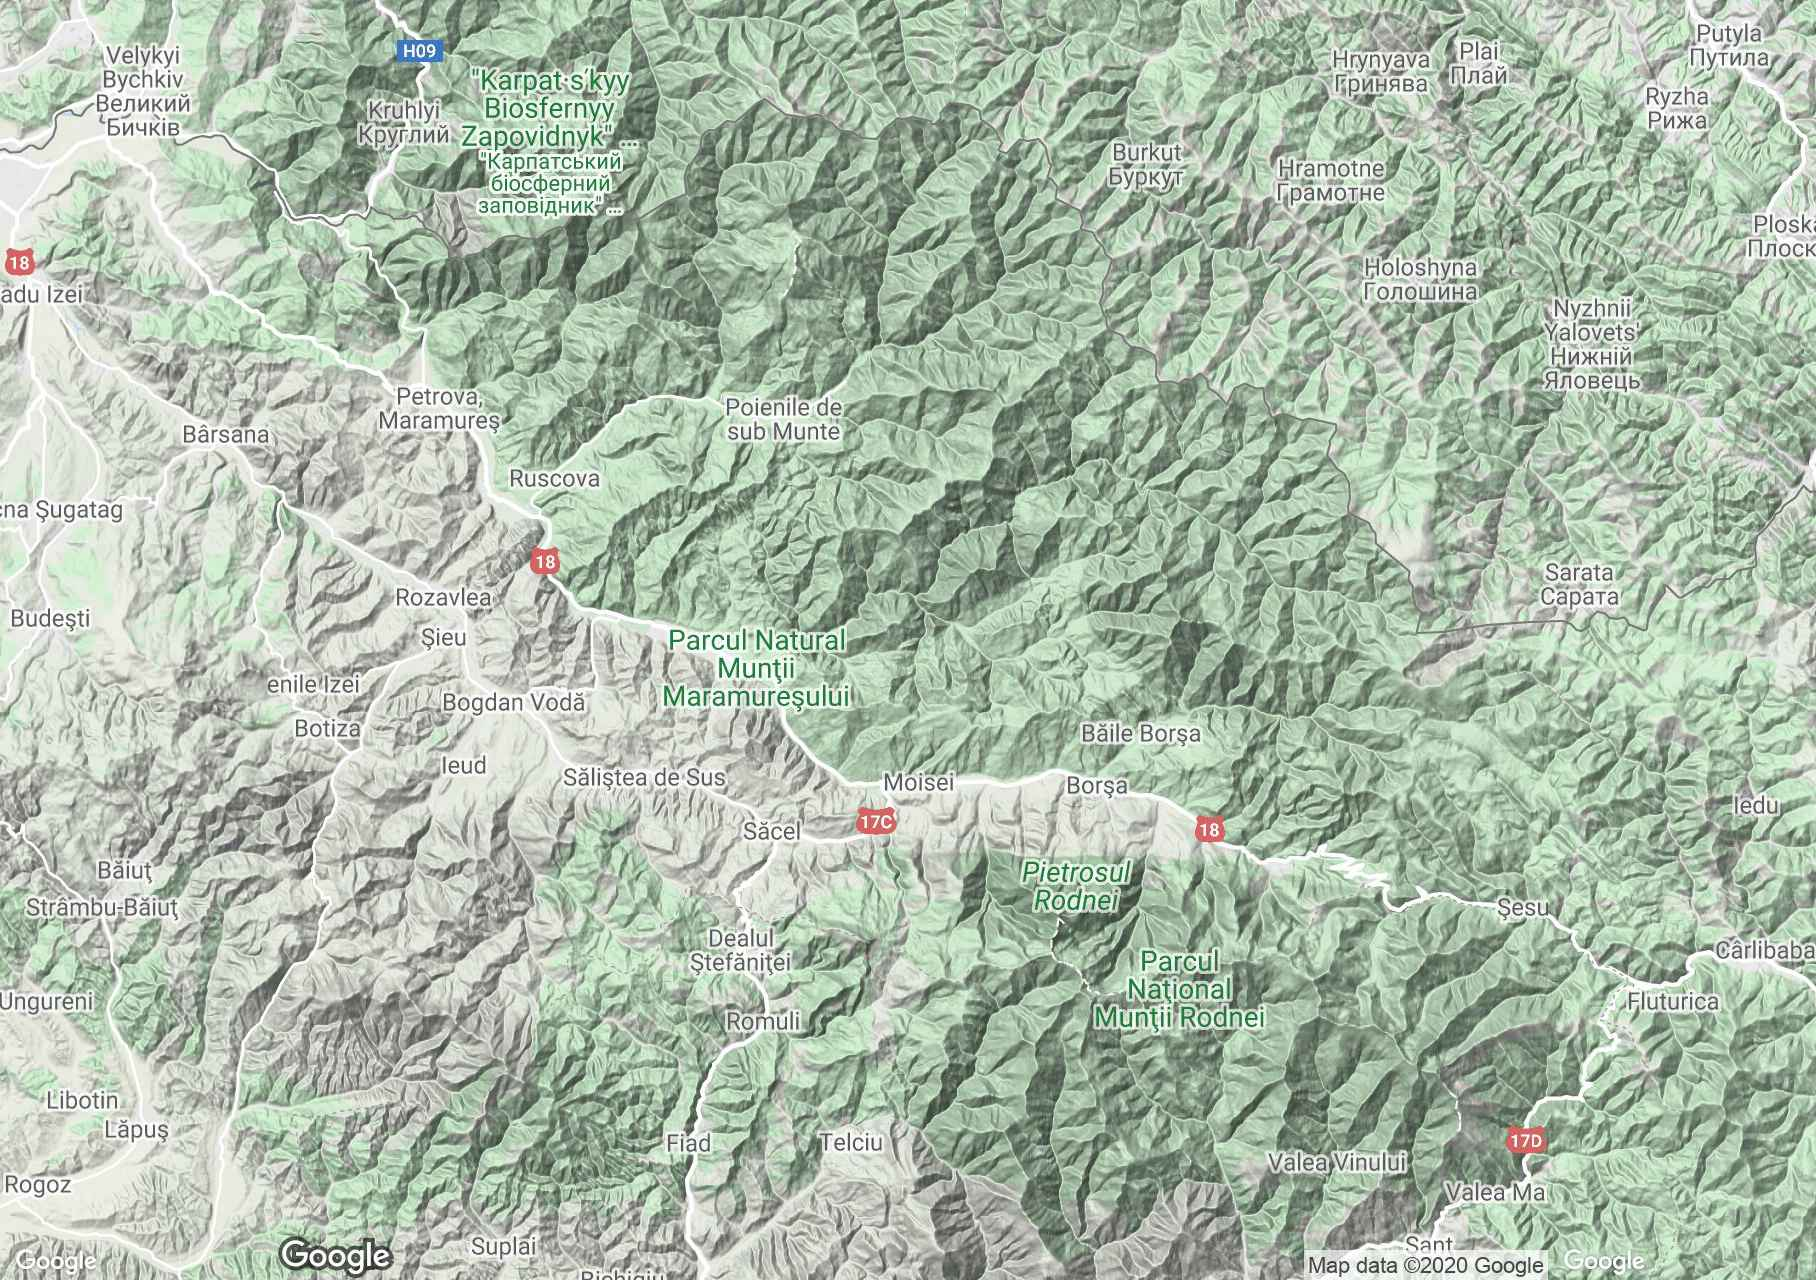 Máramarosi-havasok interaktív turista térképe.